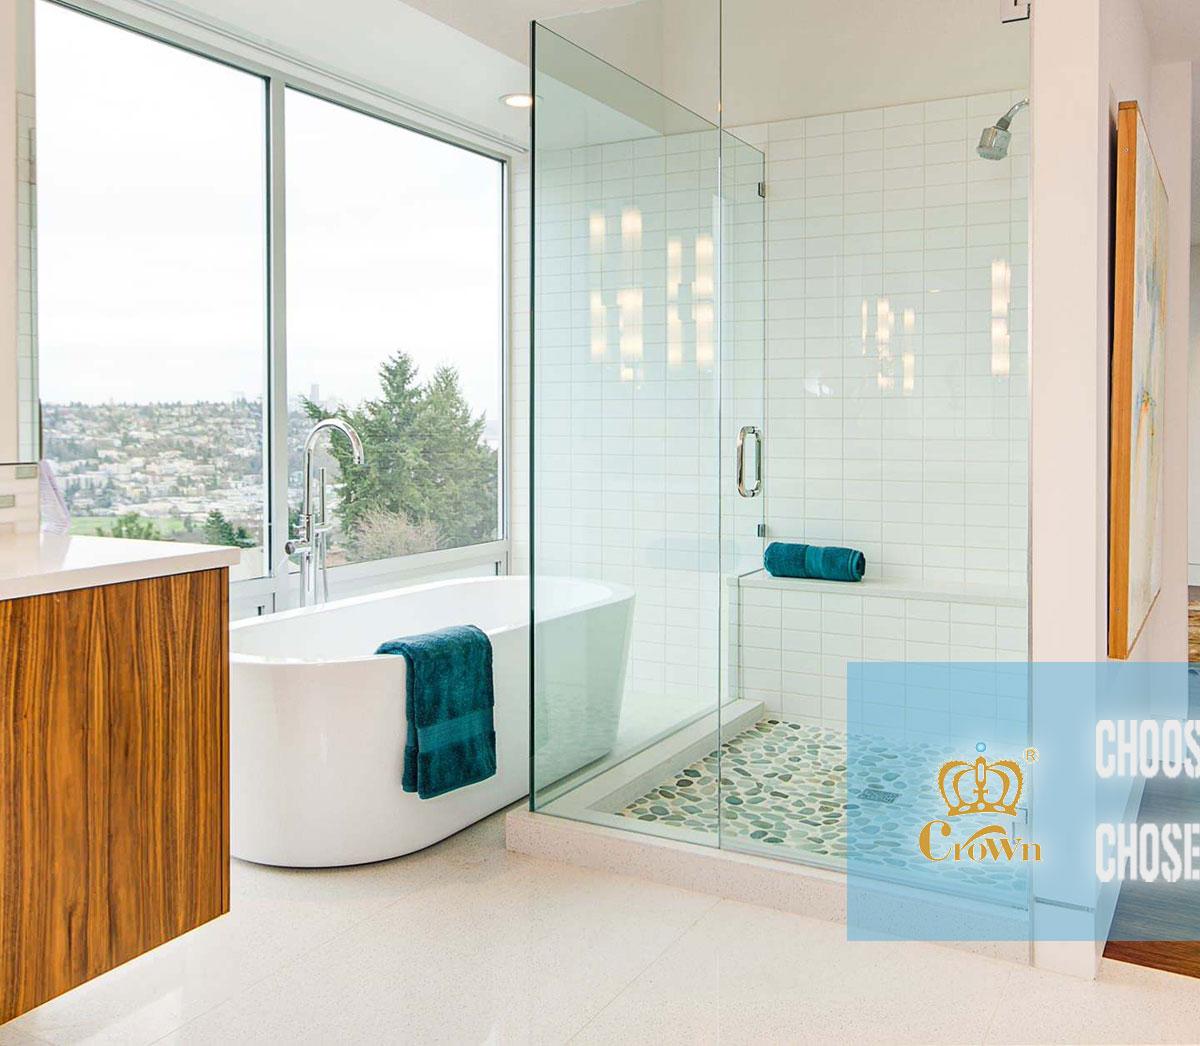 Hangzhou Crown Sanitary Ware Co., Ltd. - Shower Room, Shower Cabin